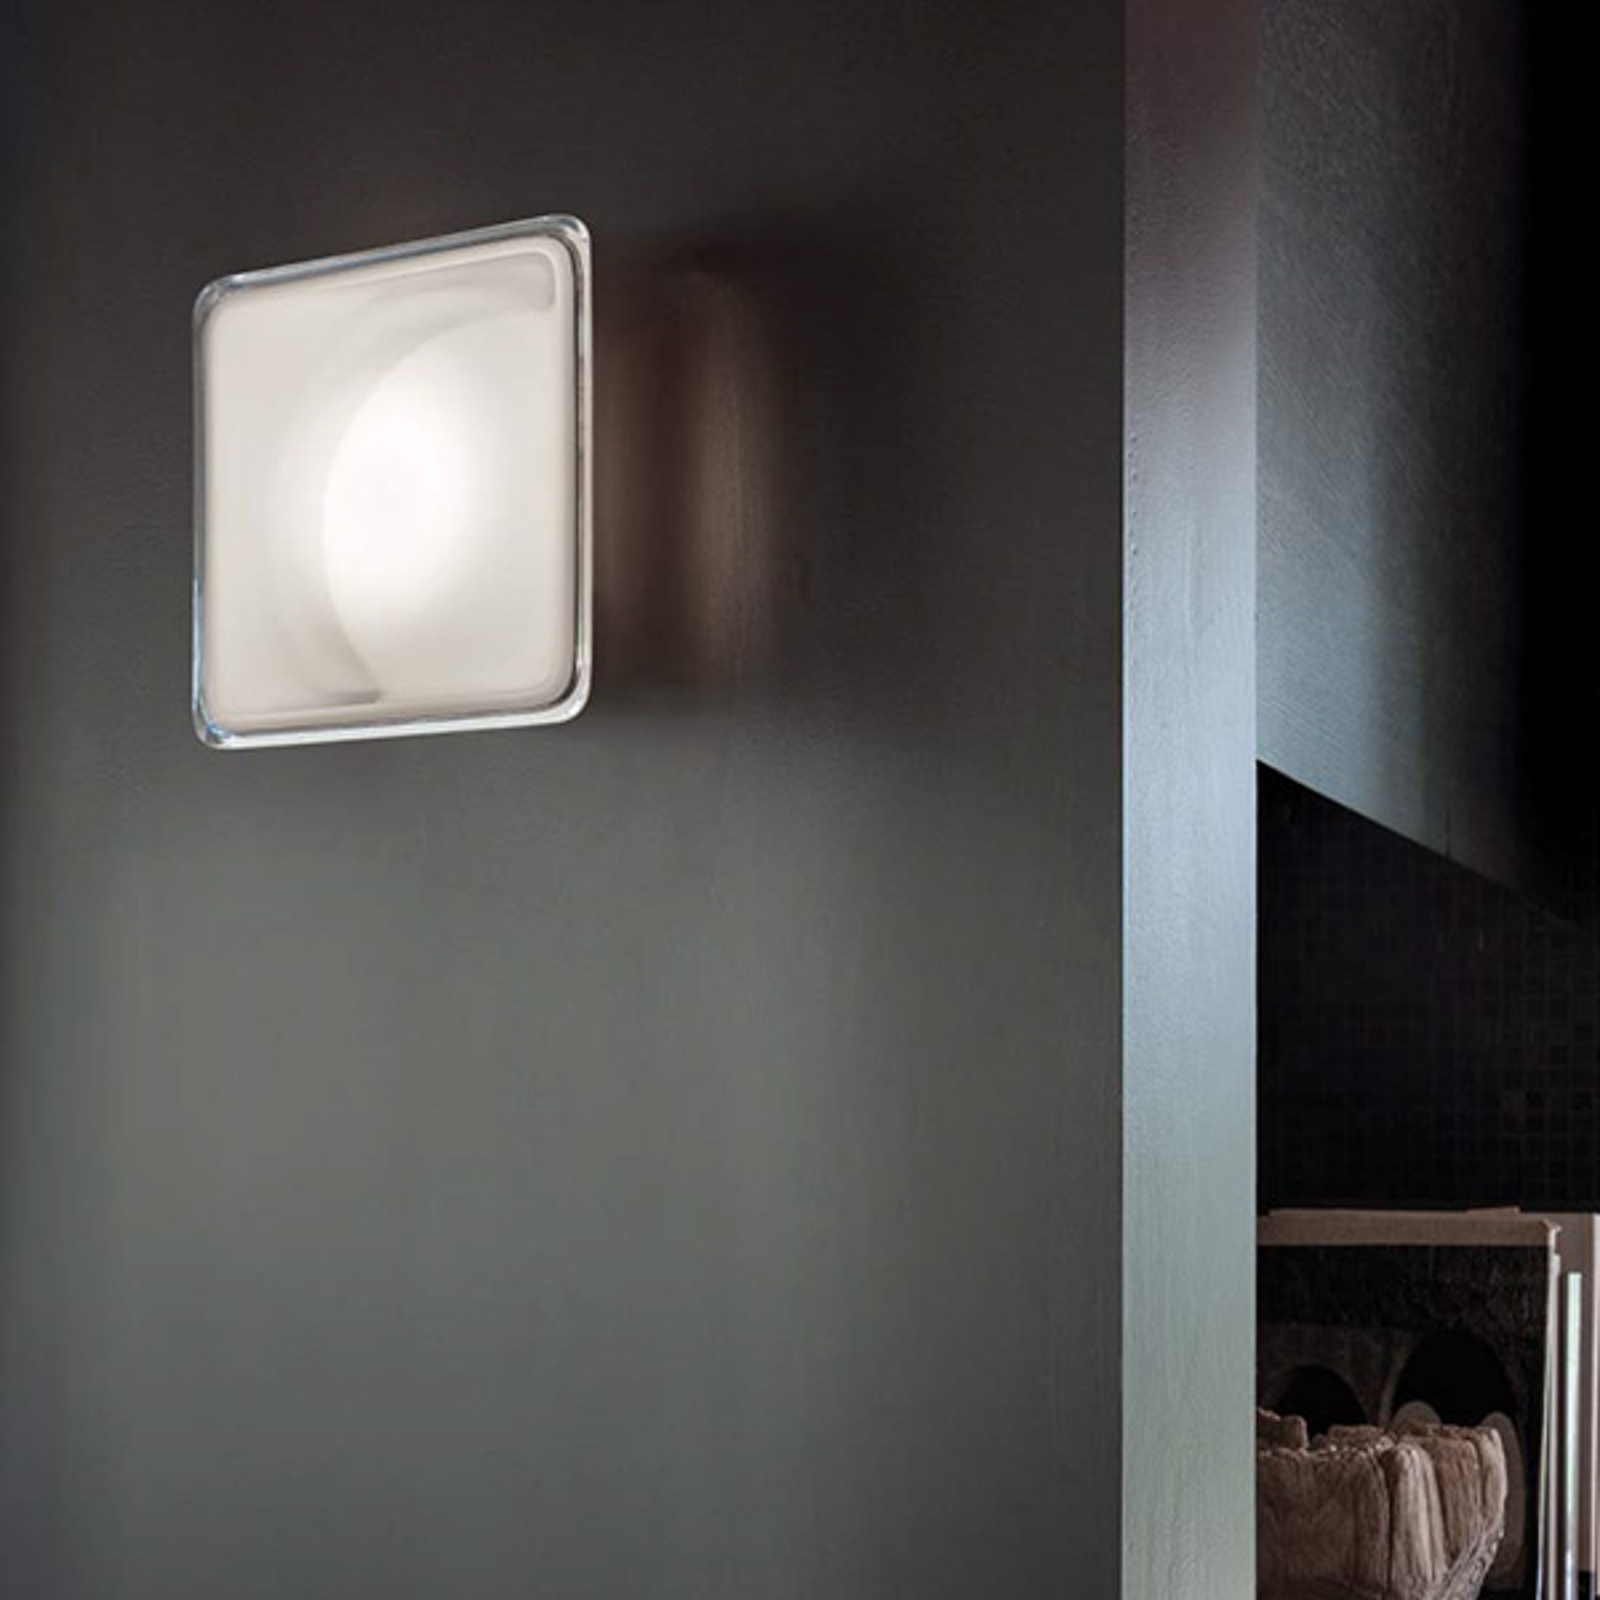 Impressionnante applique LED Illusion